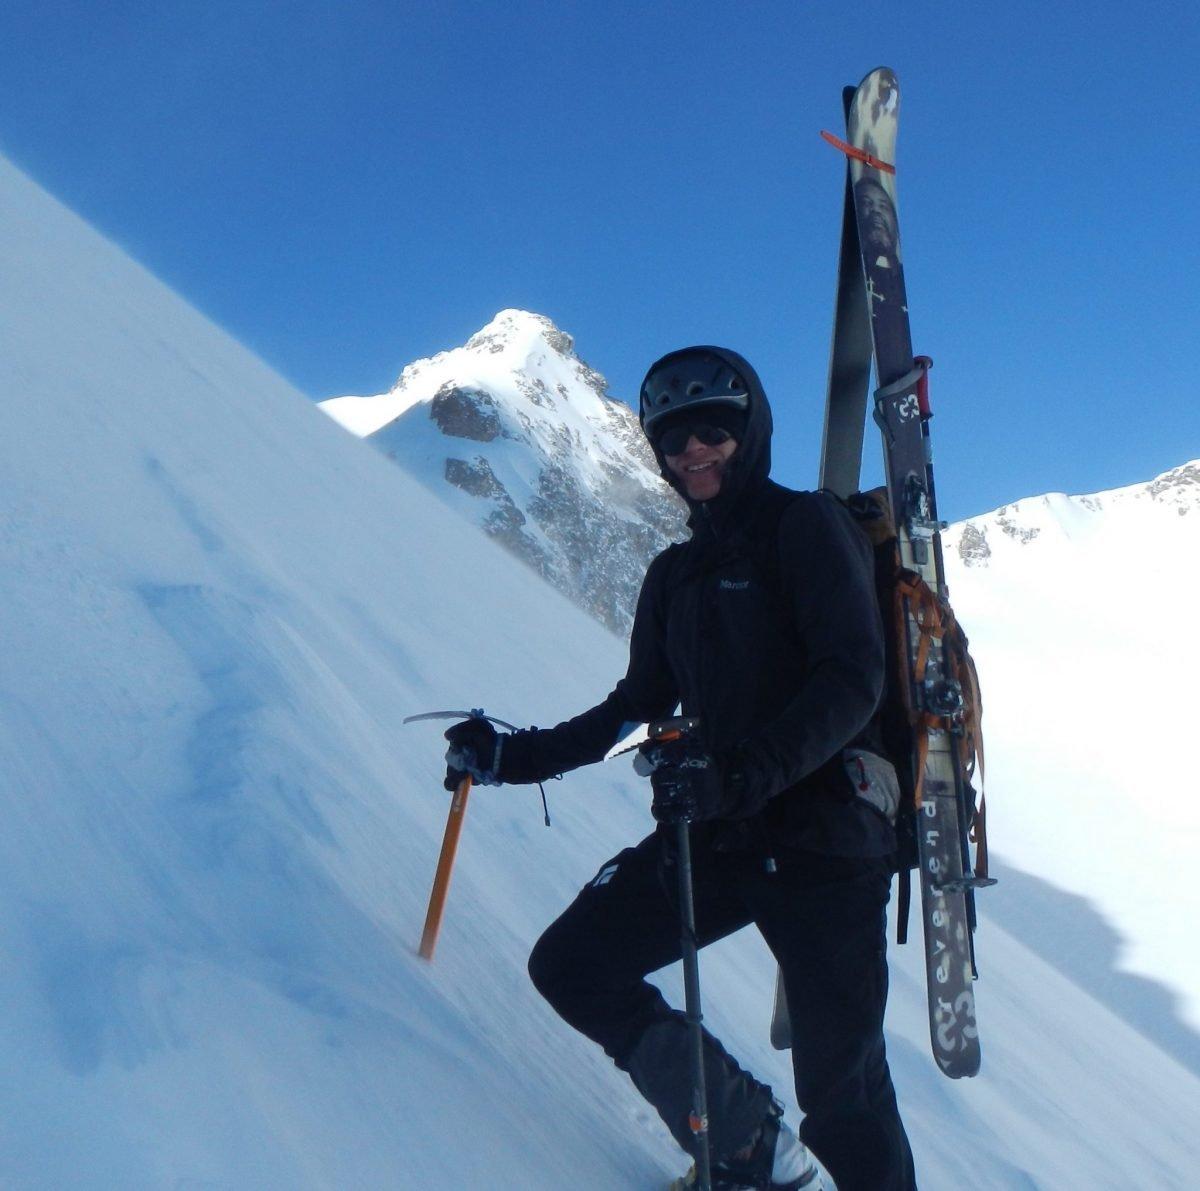 Black Diamond Carbon Whippet Ski Pole Review